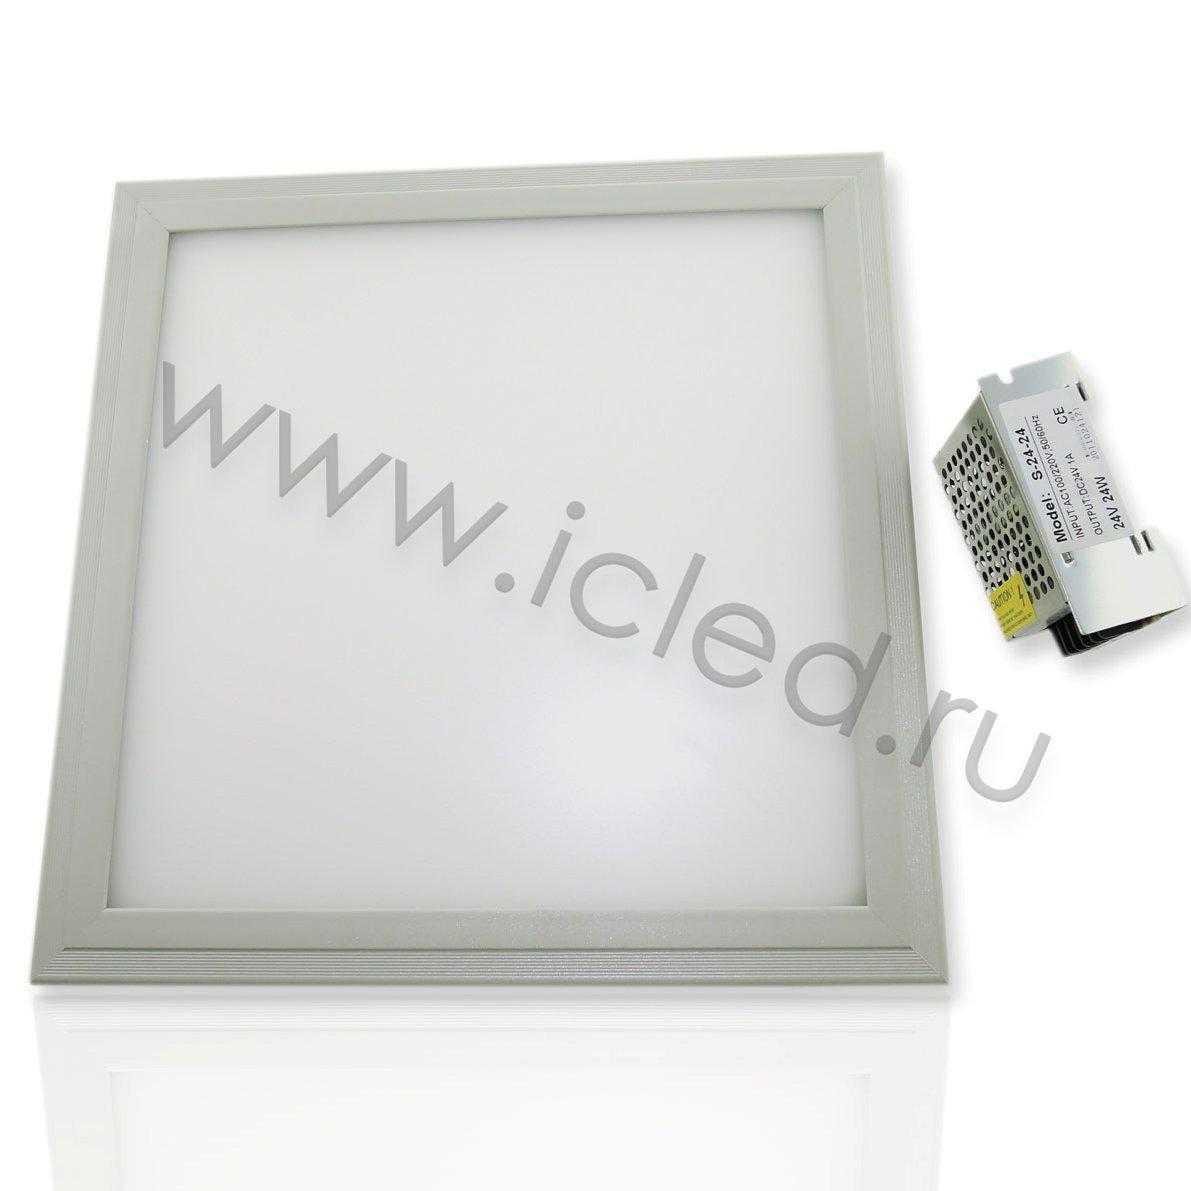 Светодиодная панель S L300 (10W, 220V, Warm White)